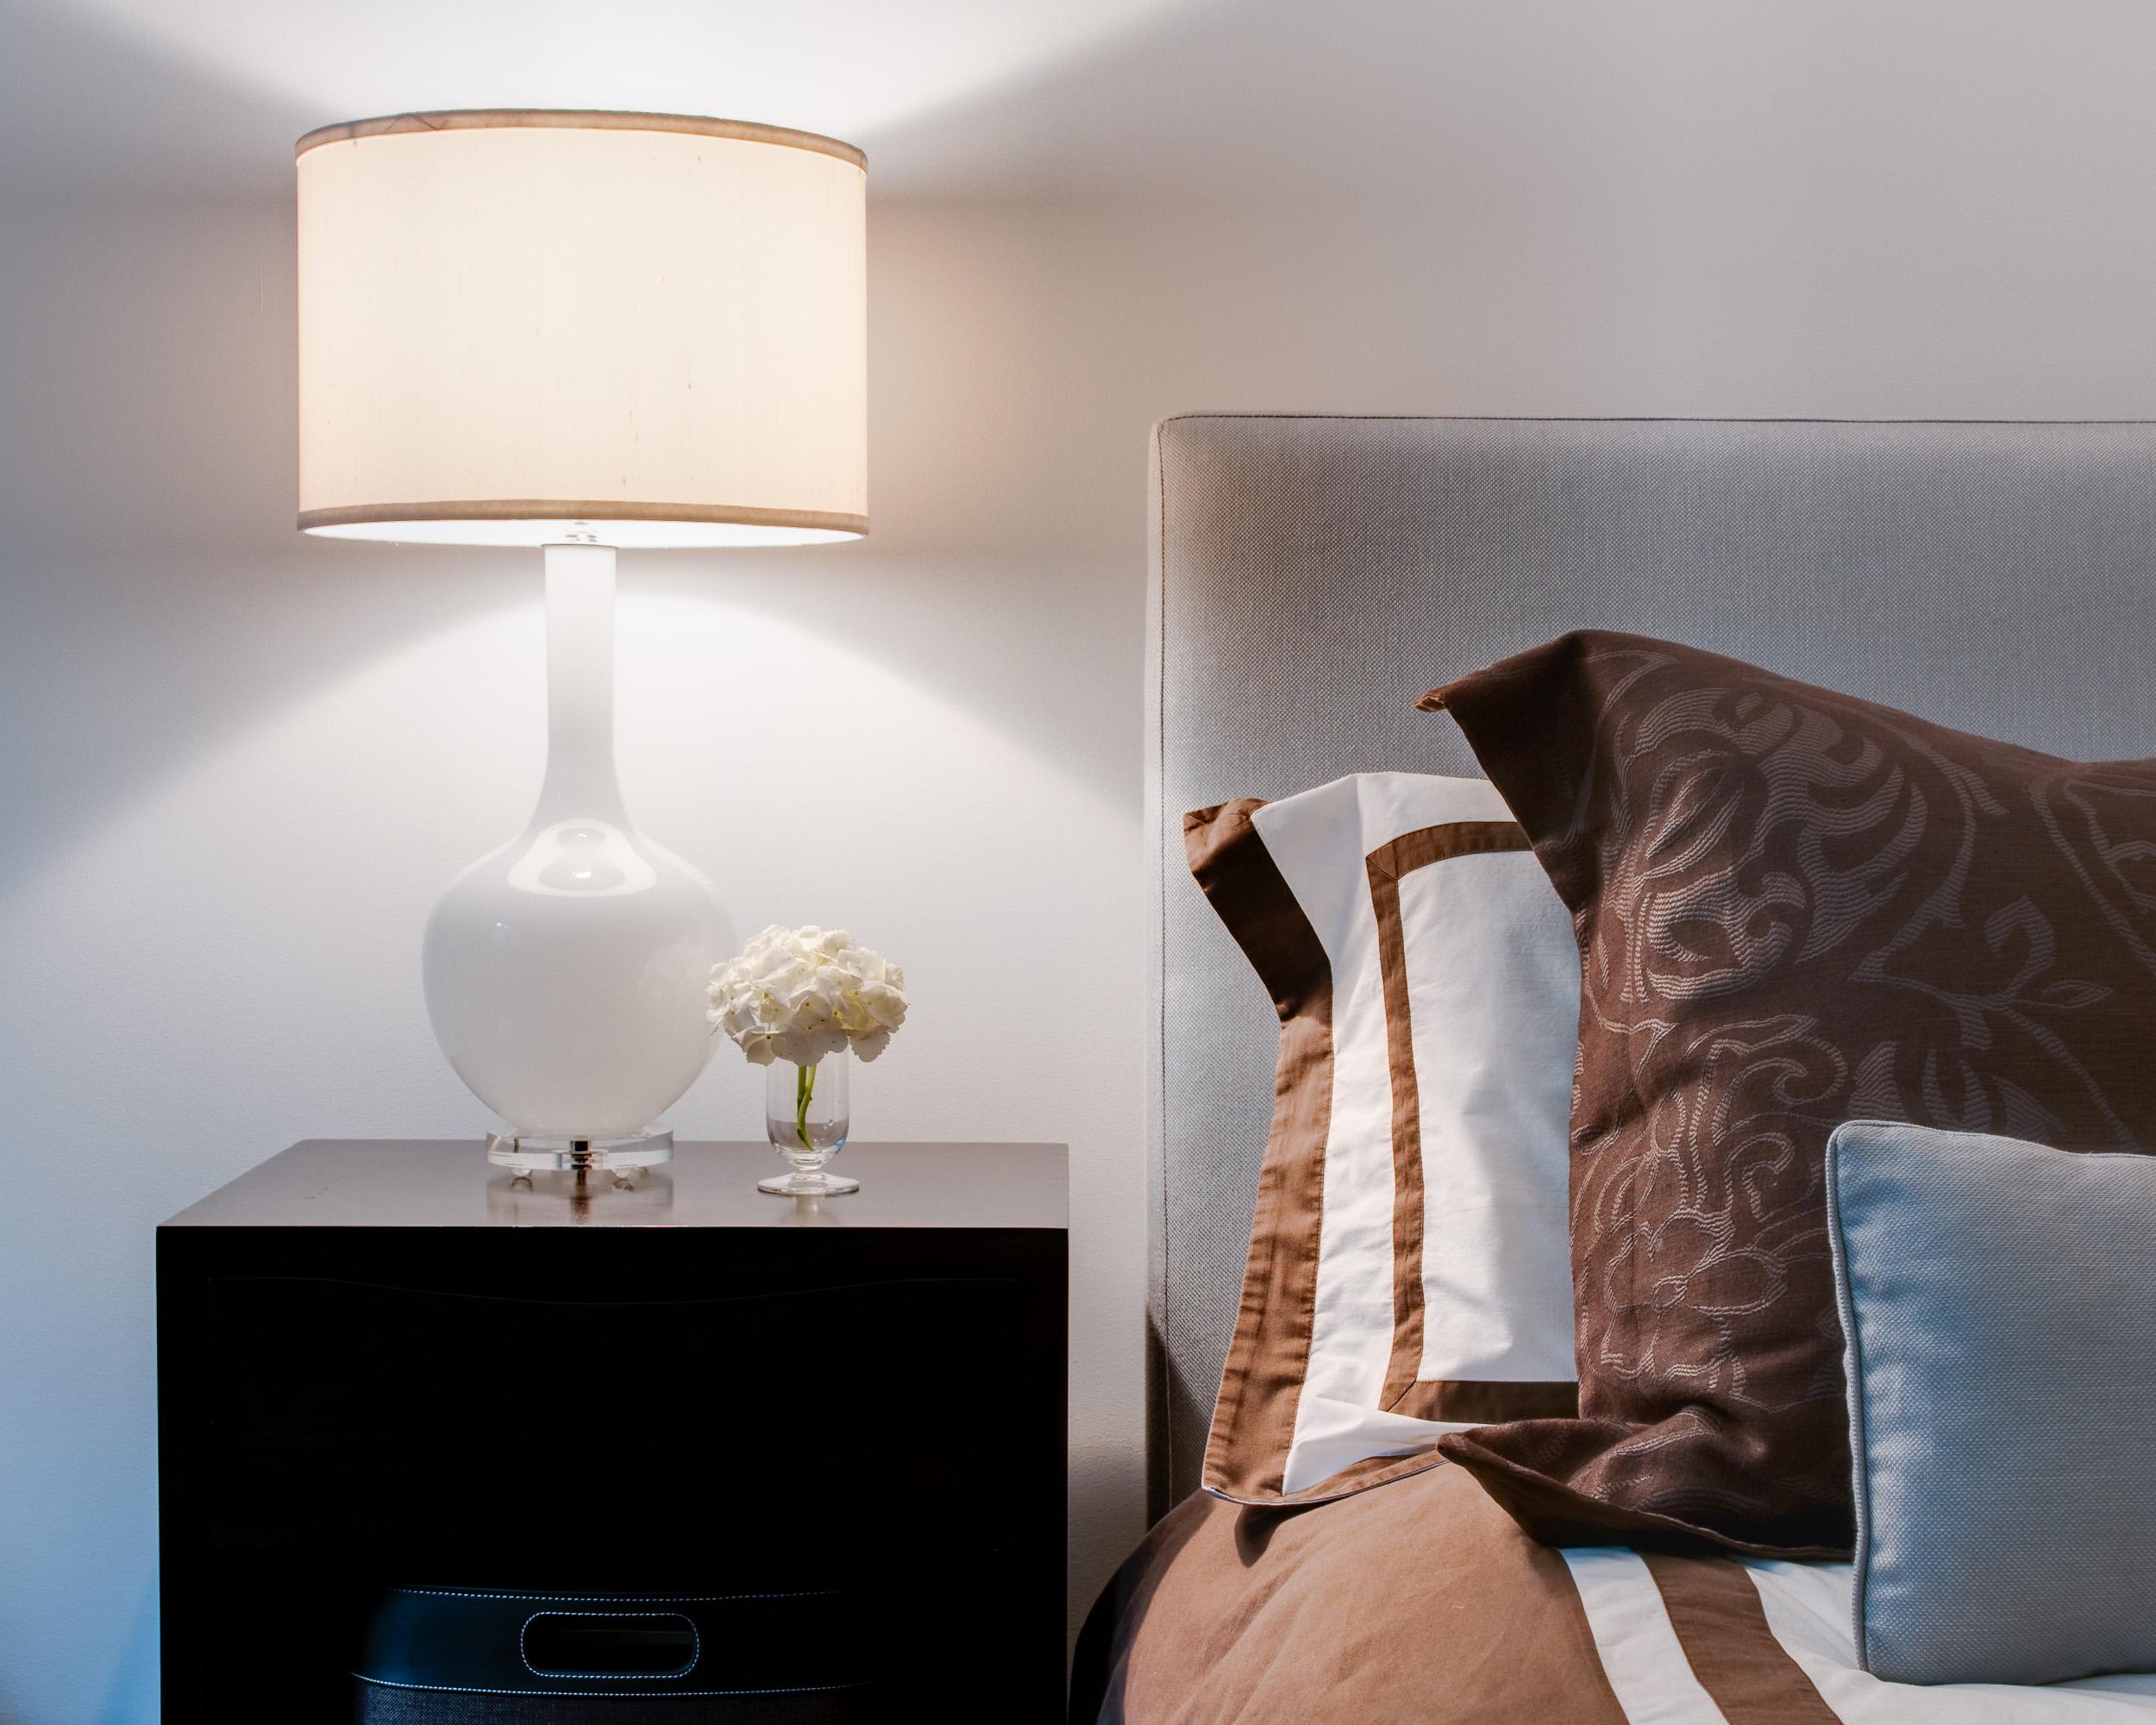 Bedroom-Detail-Interior-Design-Img2285_3_9_adjust.jpg